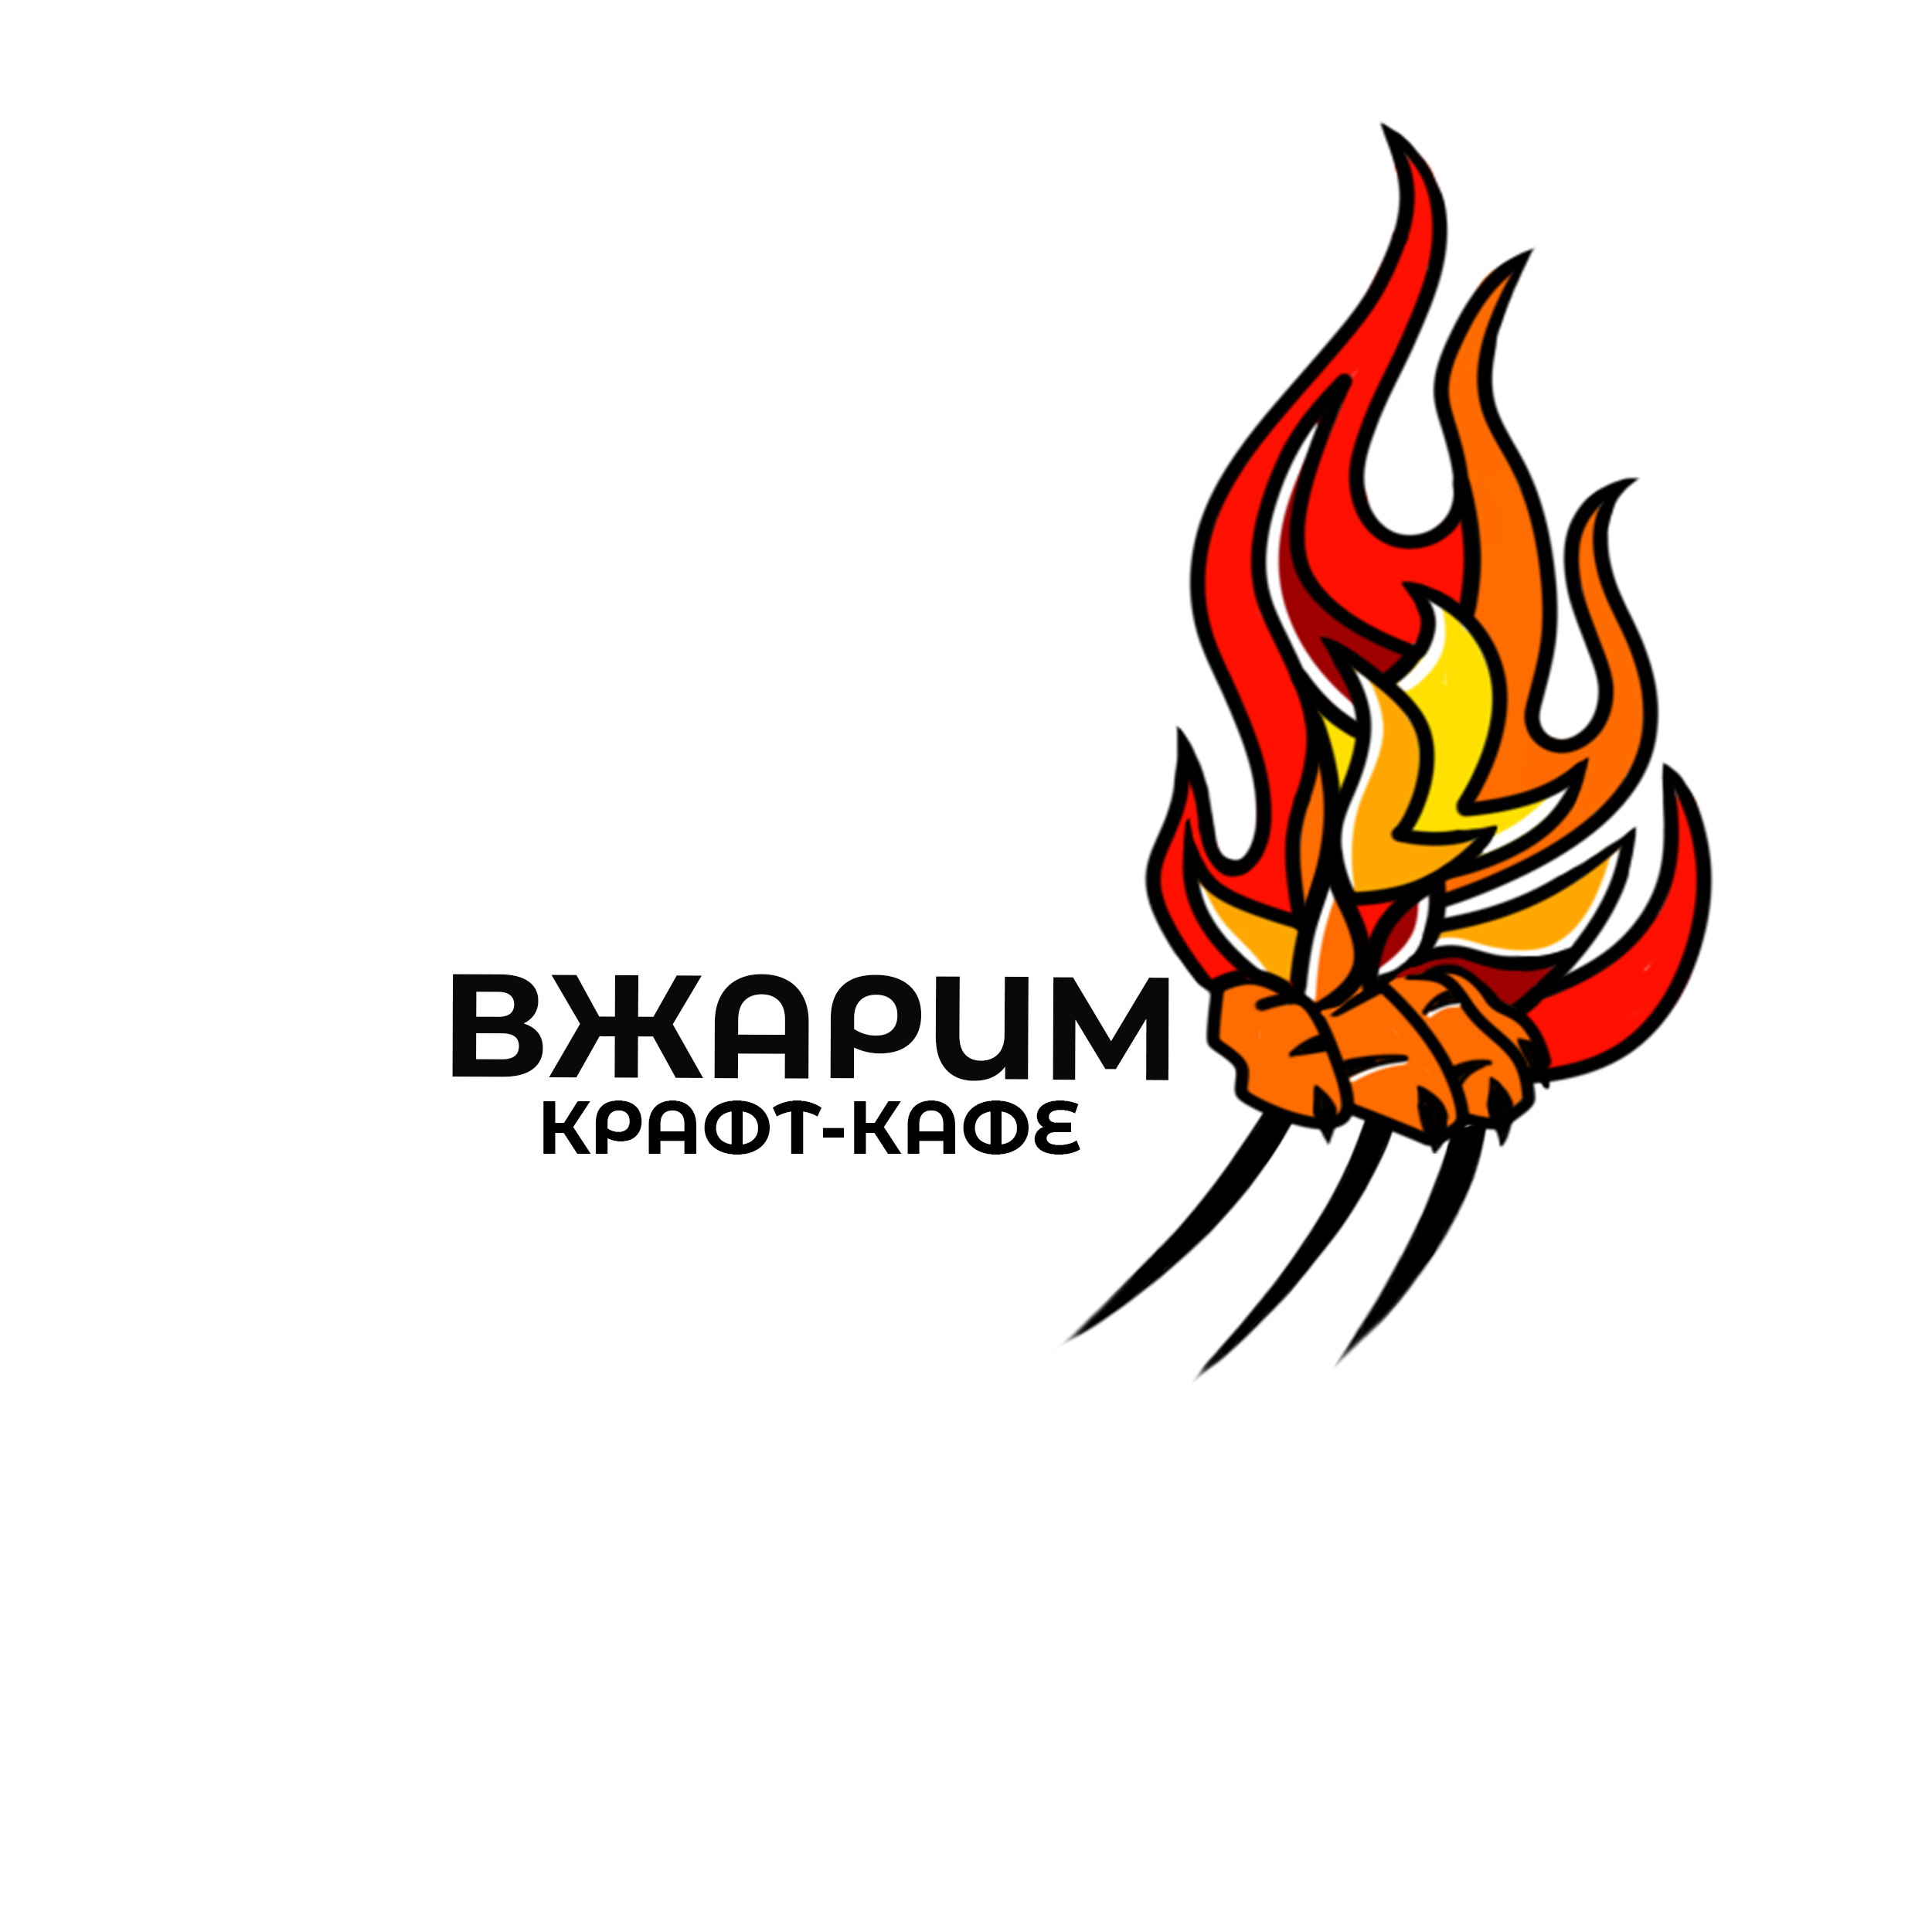 Требуется, разработка логотипа для крафт-кафе «ВЖАРИМ». фото f_32960085f51bf5d1.png